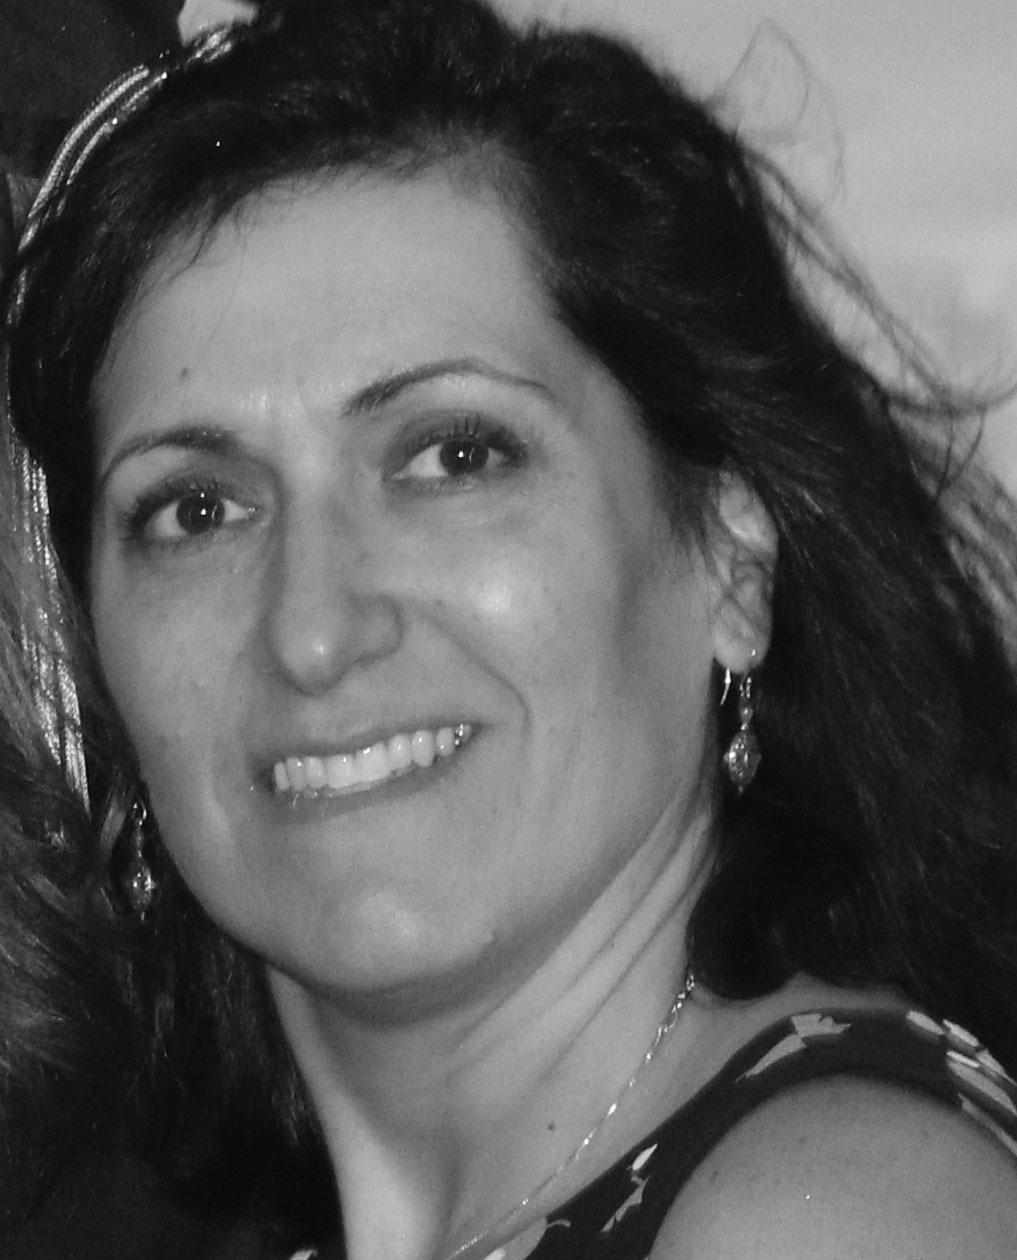 iEARN-USA Change Maker: Maria Conte